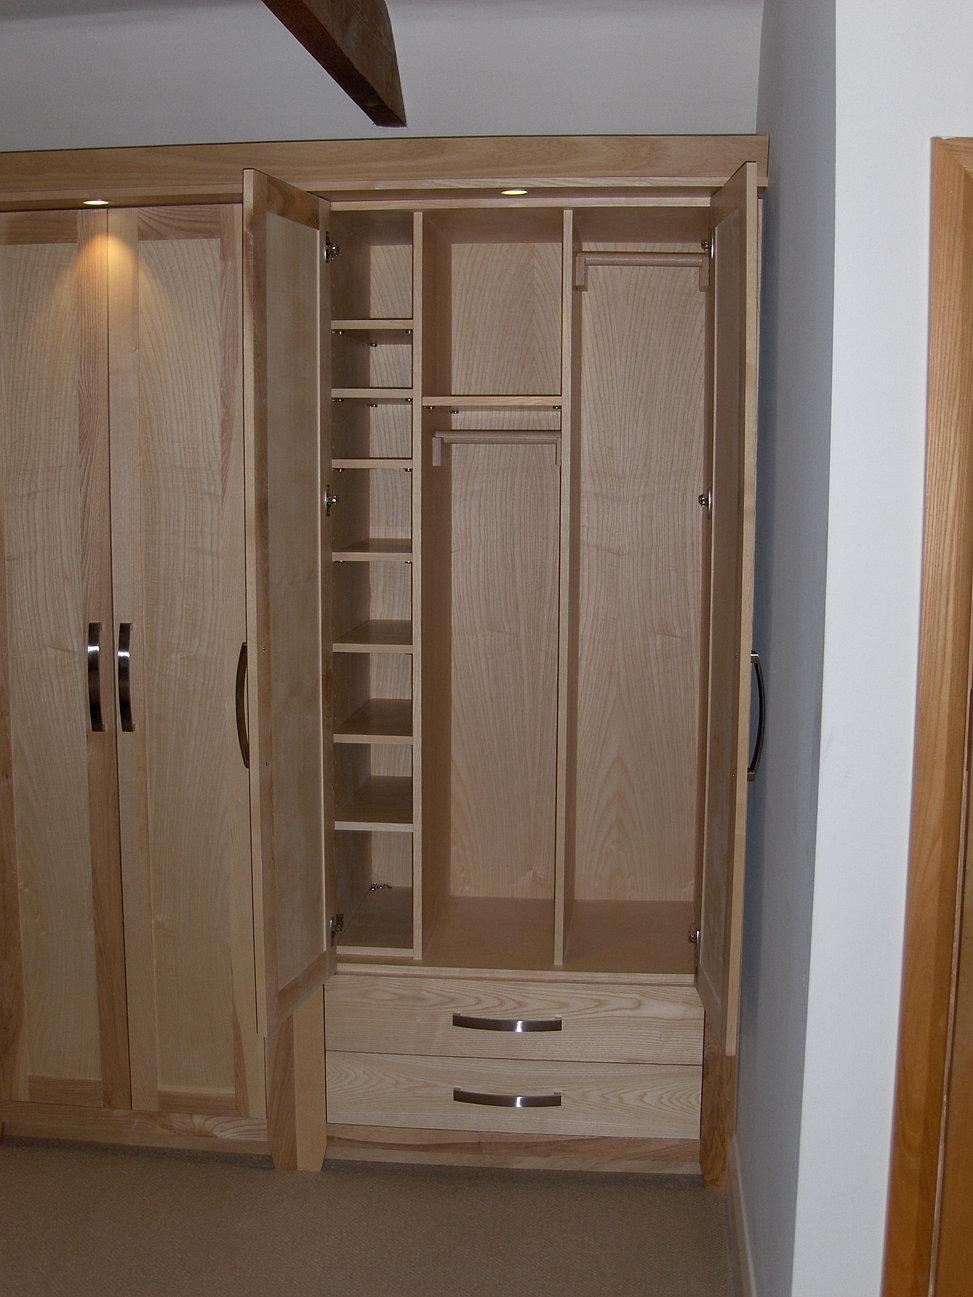 Solid Ash Bedroom Furniture Inwood Design Handmade Bedrooms